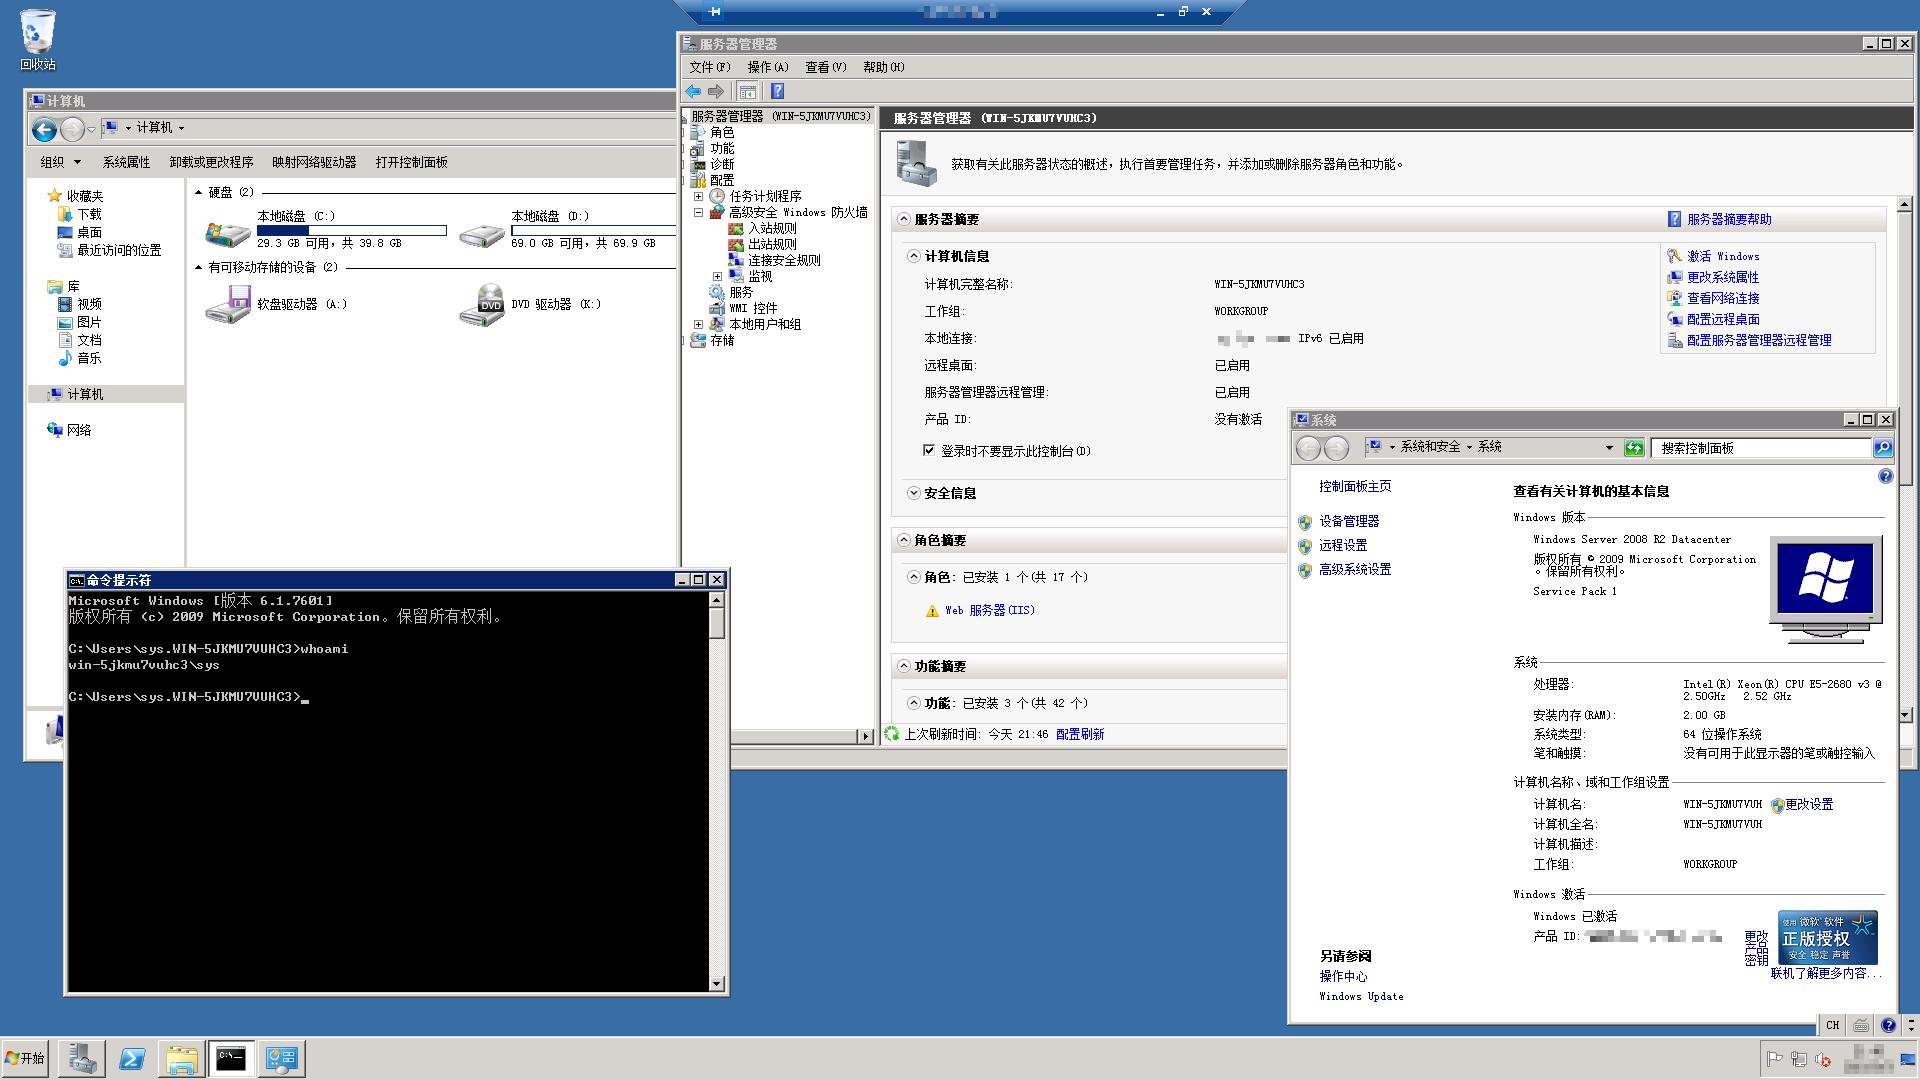 rdp-desktop-view